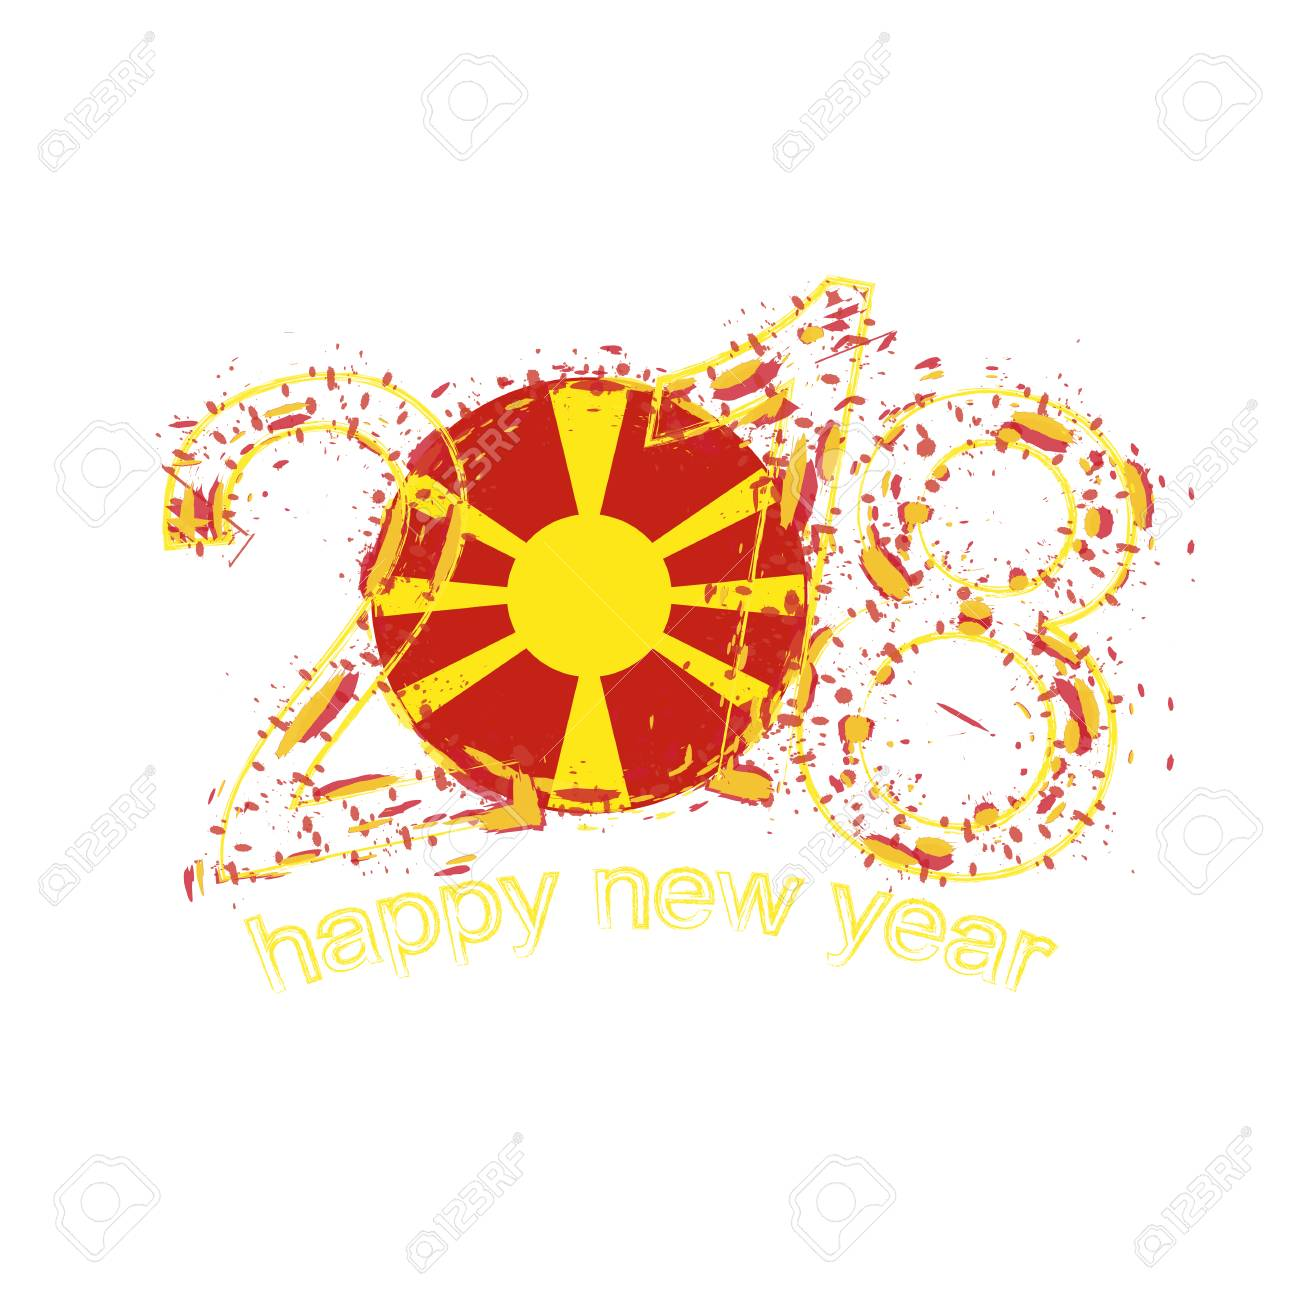 2018 happy new year macedonia grunge vector template for greeting 2018 happy new year macedonia grunge vector template for greeting card calendars 2018 seasonal kristyandbryce Images